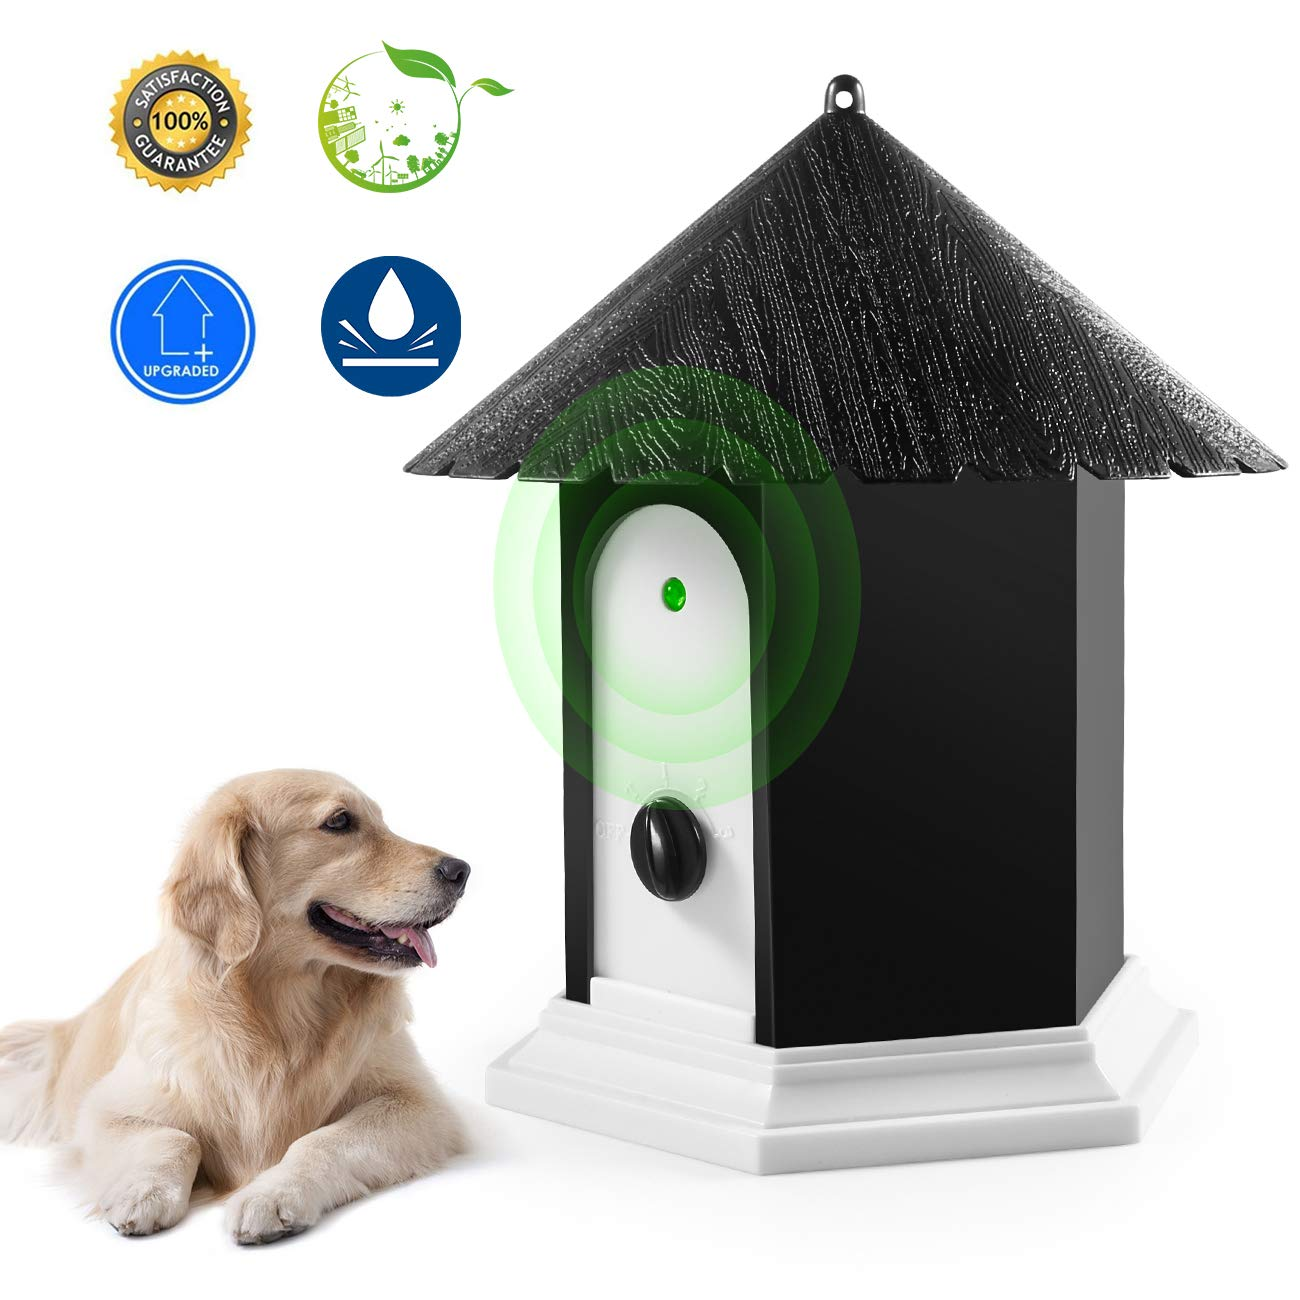 PET CAREE Anti Barking Device, Ultrasonic Dog Bark Controller, Waterproof Outdoor Anti Bark Control System in Birdhouse Shape